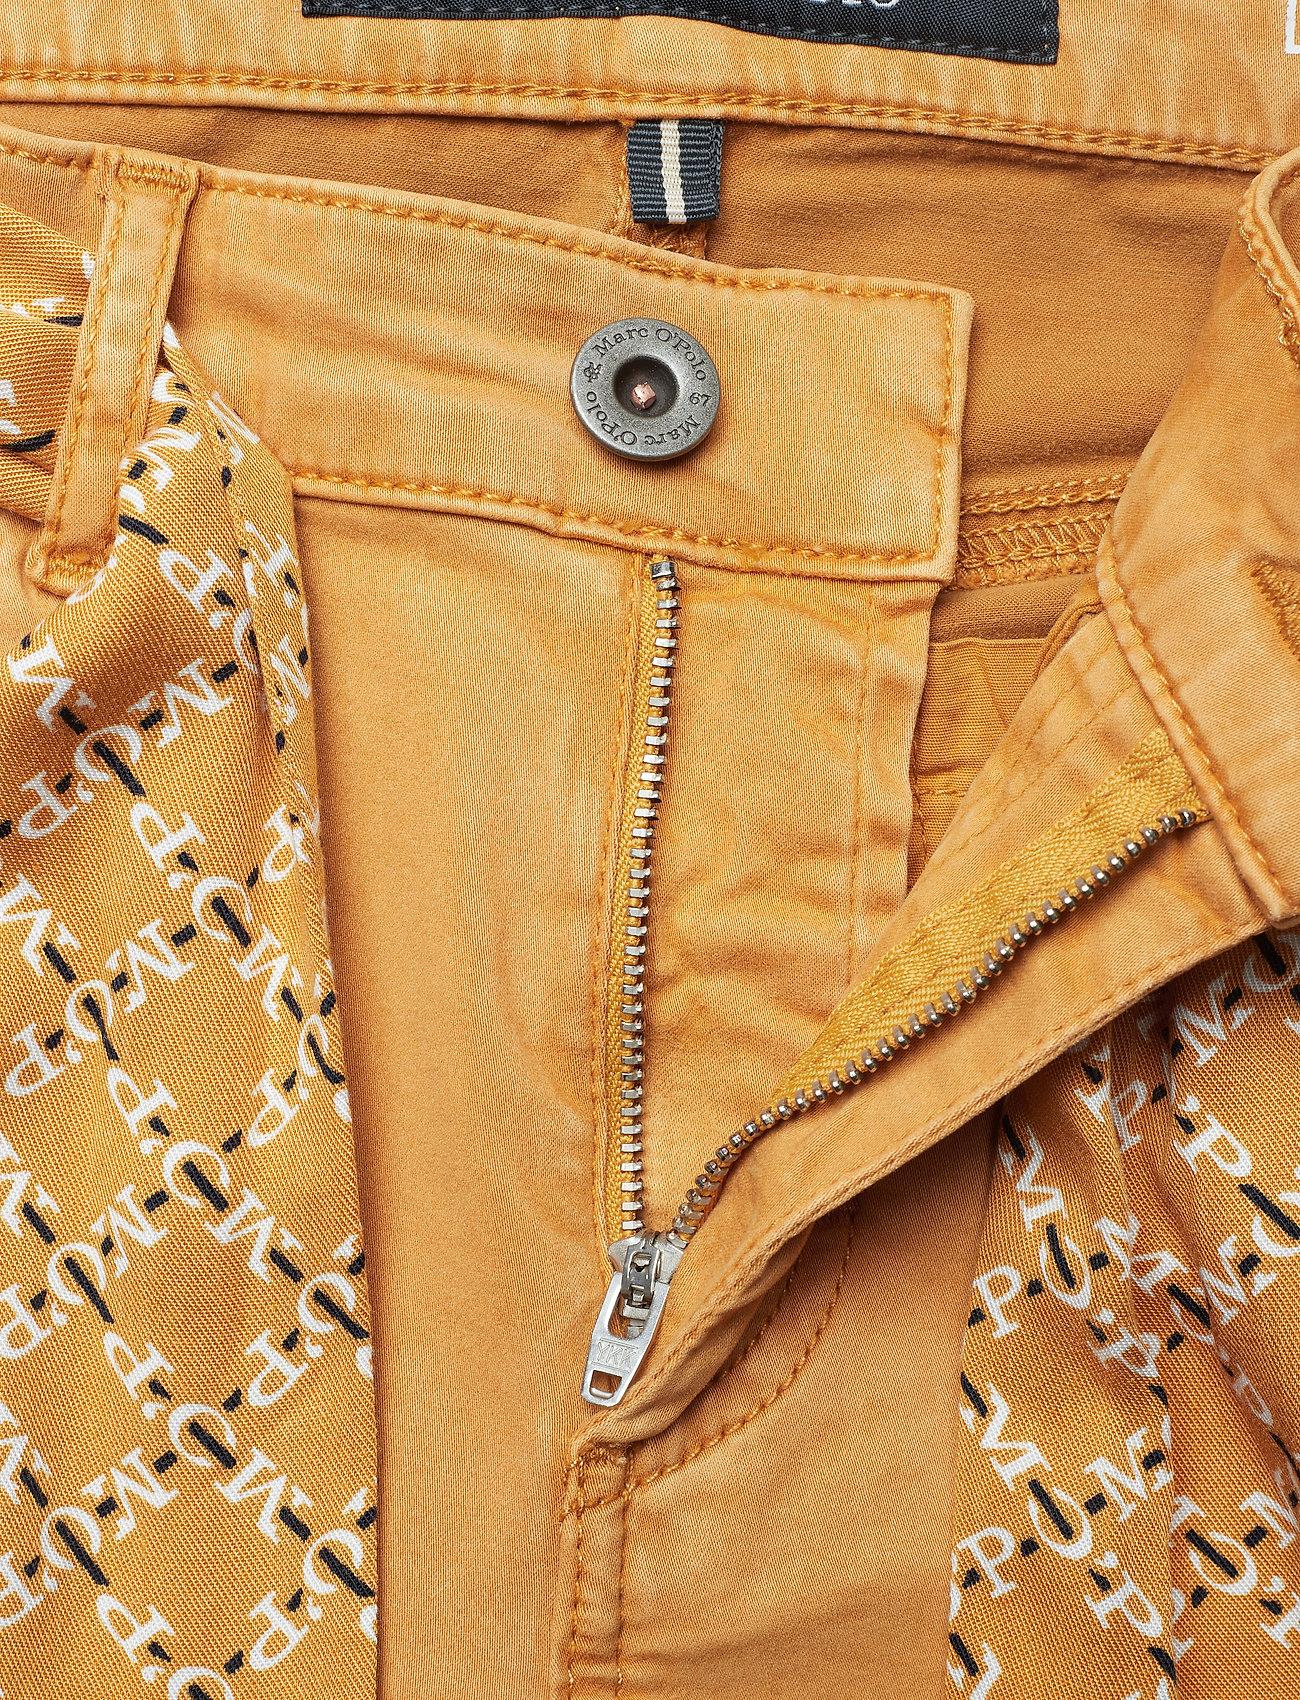 Marc O'Polo Jeans (Amber Wheat), 525